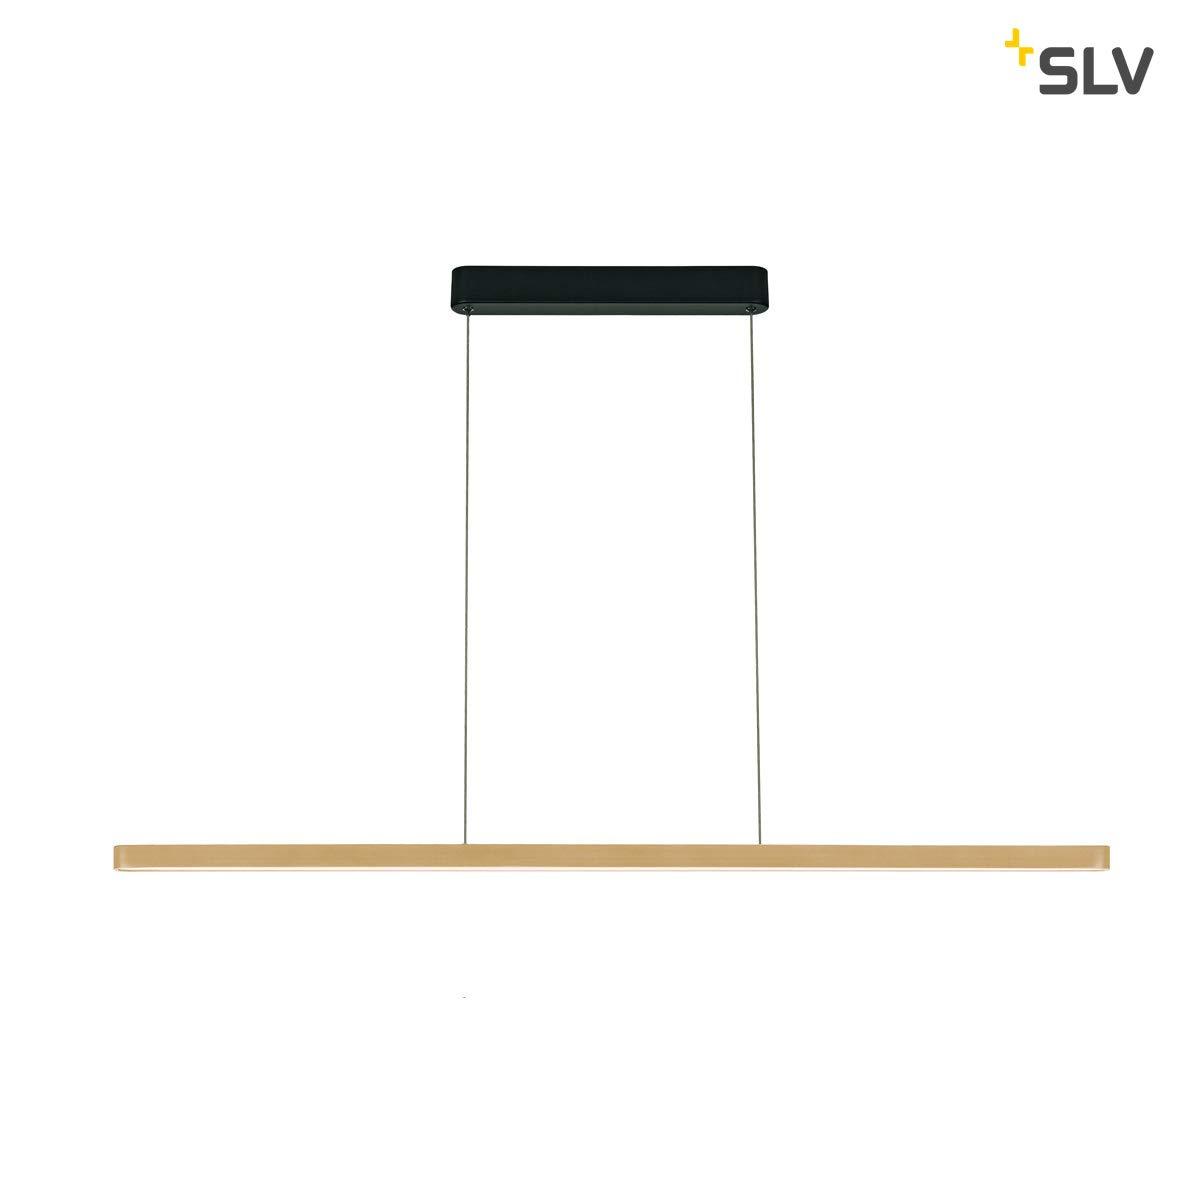 SLV A++ to A,Vincelli D,LED,29 W Bambus Hell 119 x 3.5 x 2.8 cm 156268